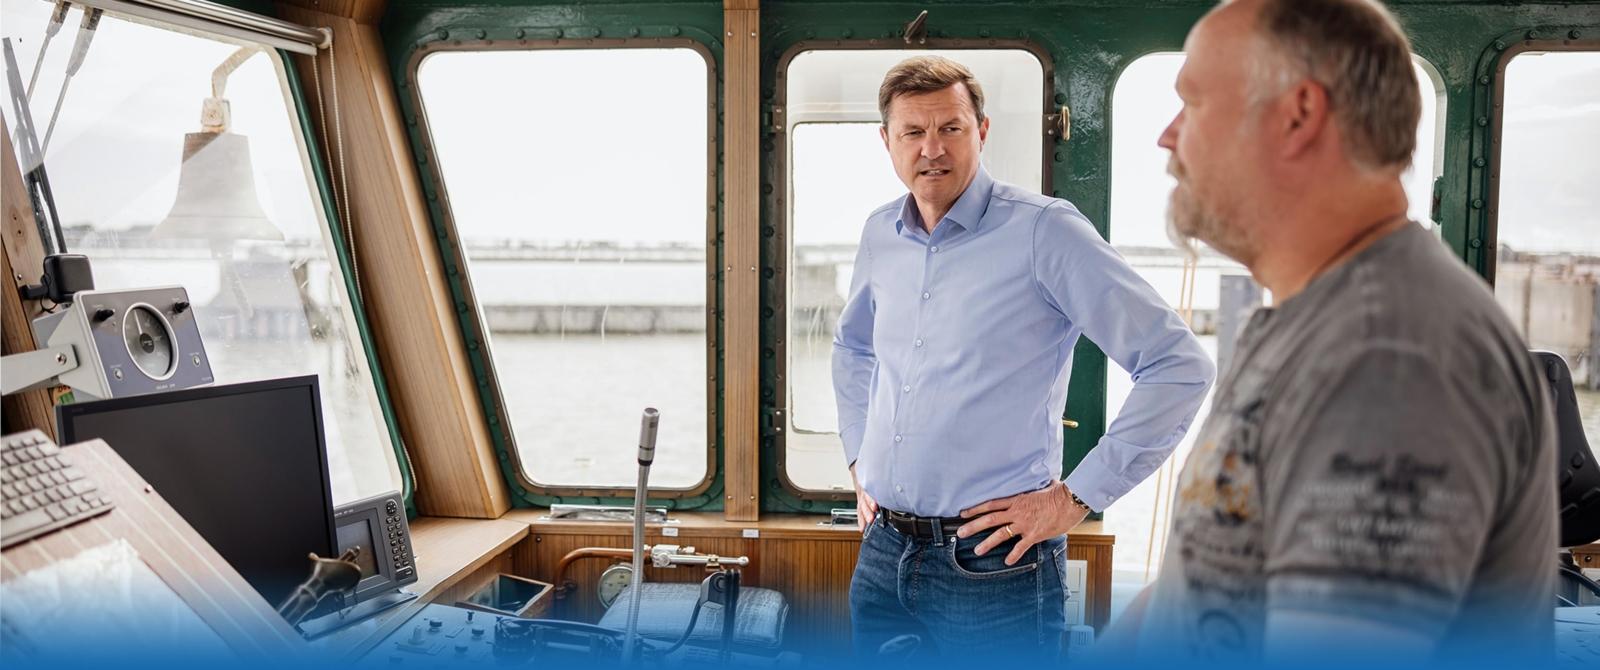 slider-oliver-grundmann-2021-bundestagswahlen-stade-rotenburg-bremervoerde (51)